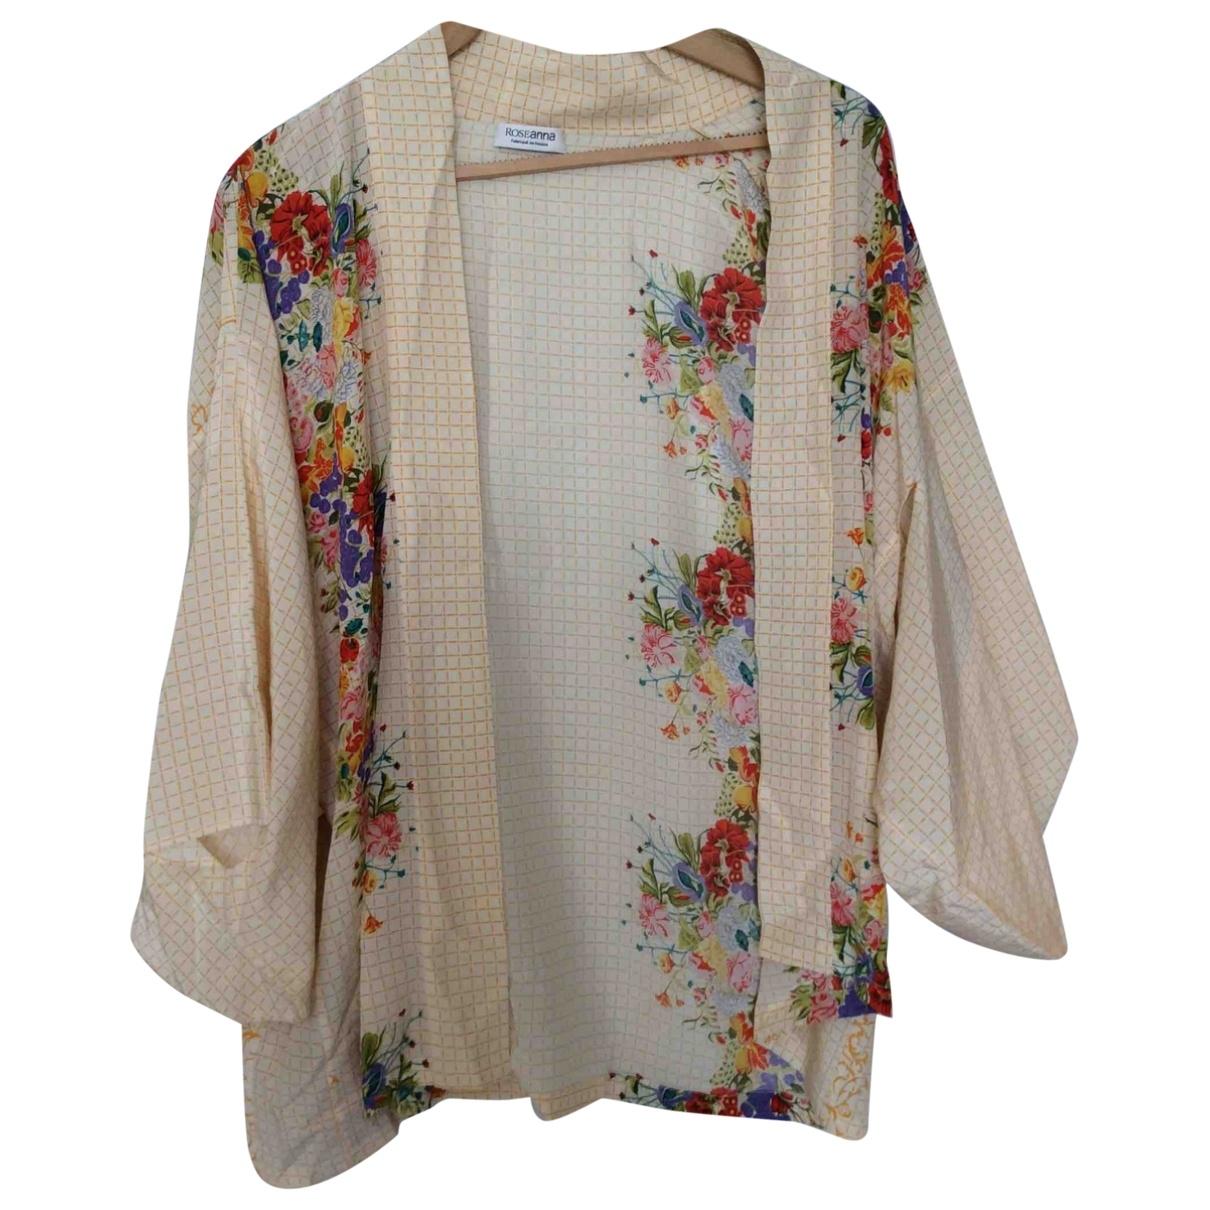 Roseanna \N Multicolour Silk jacket for Women One Size 0-5